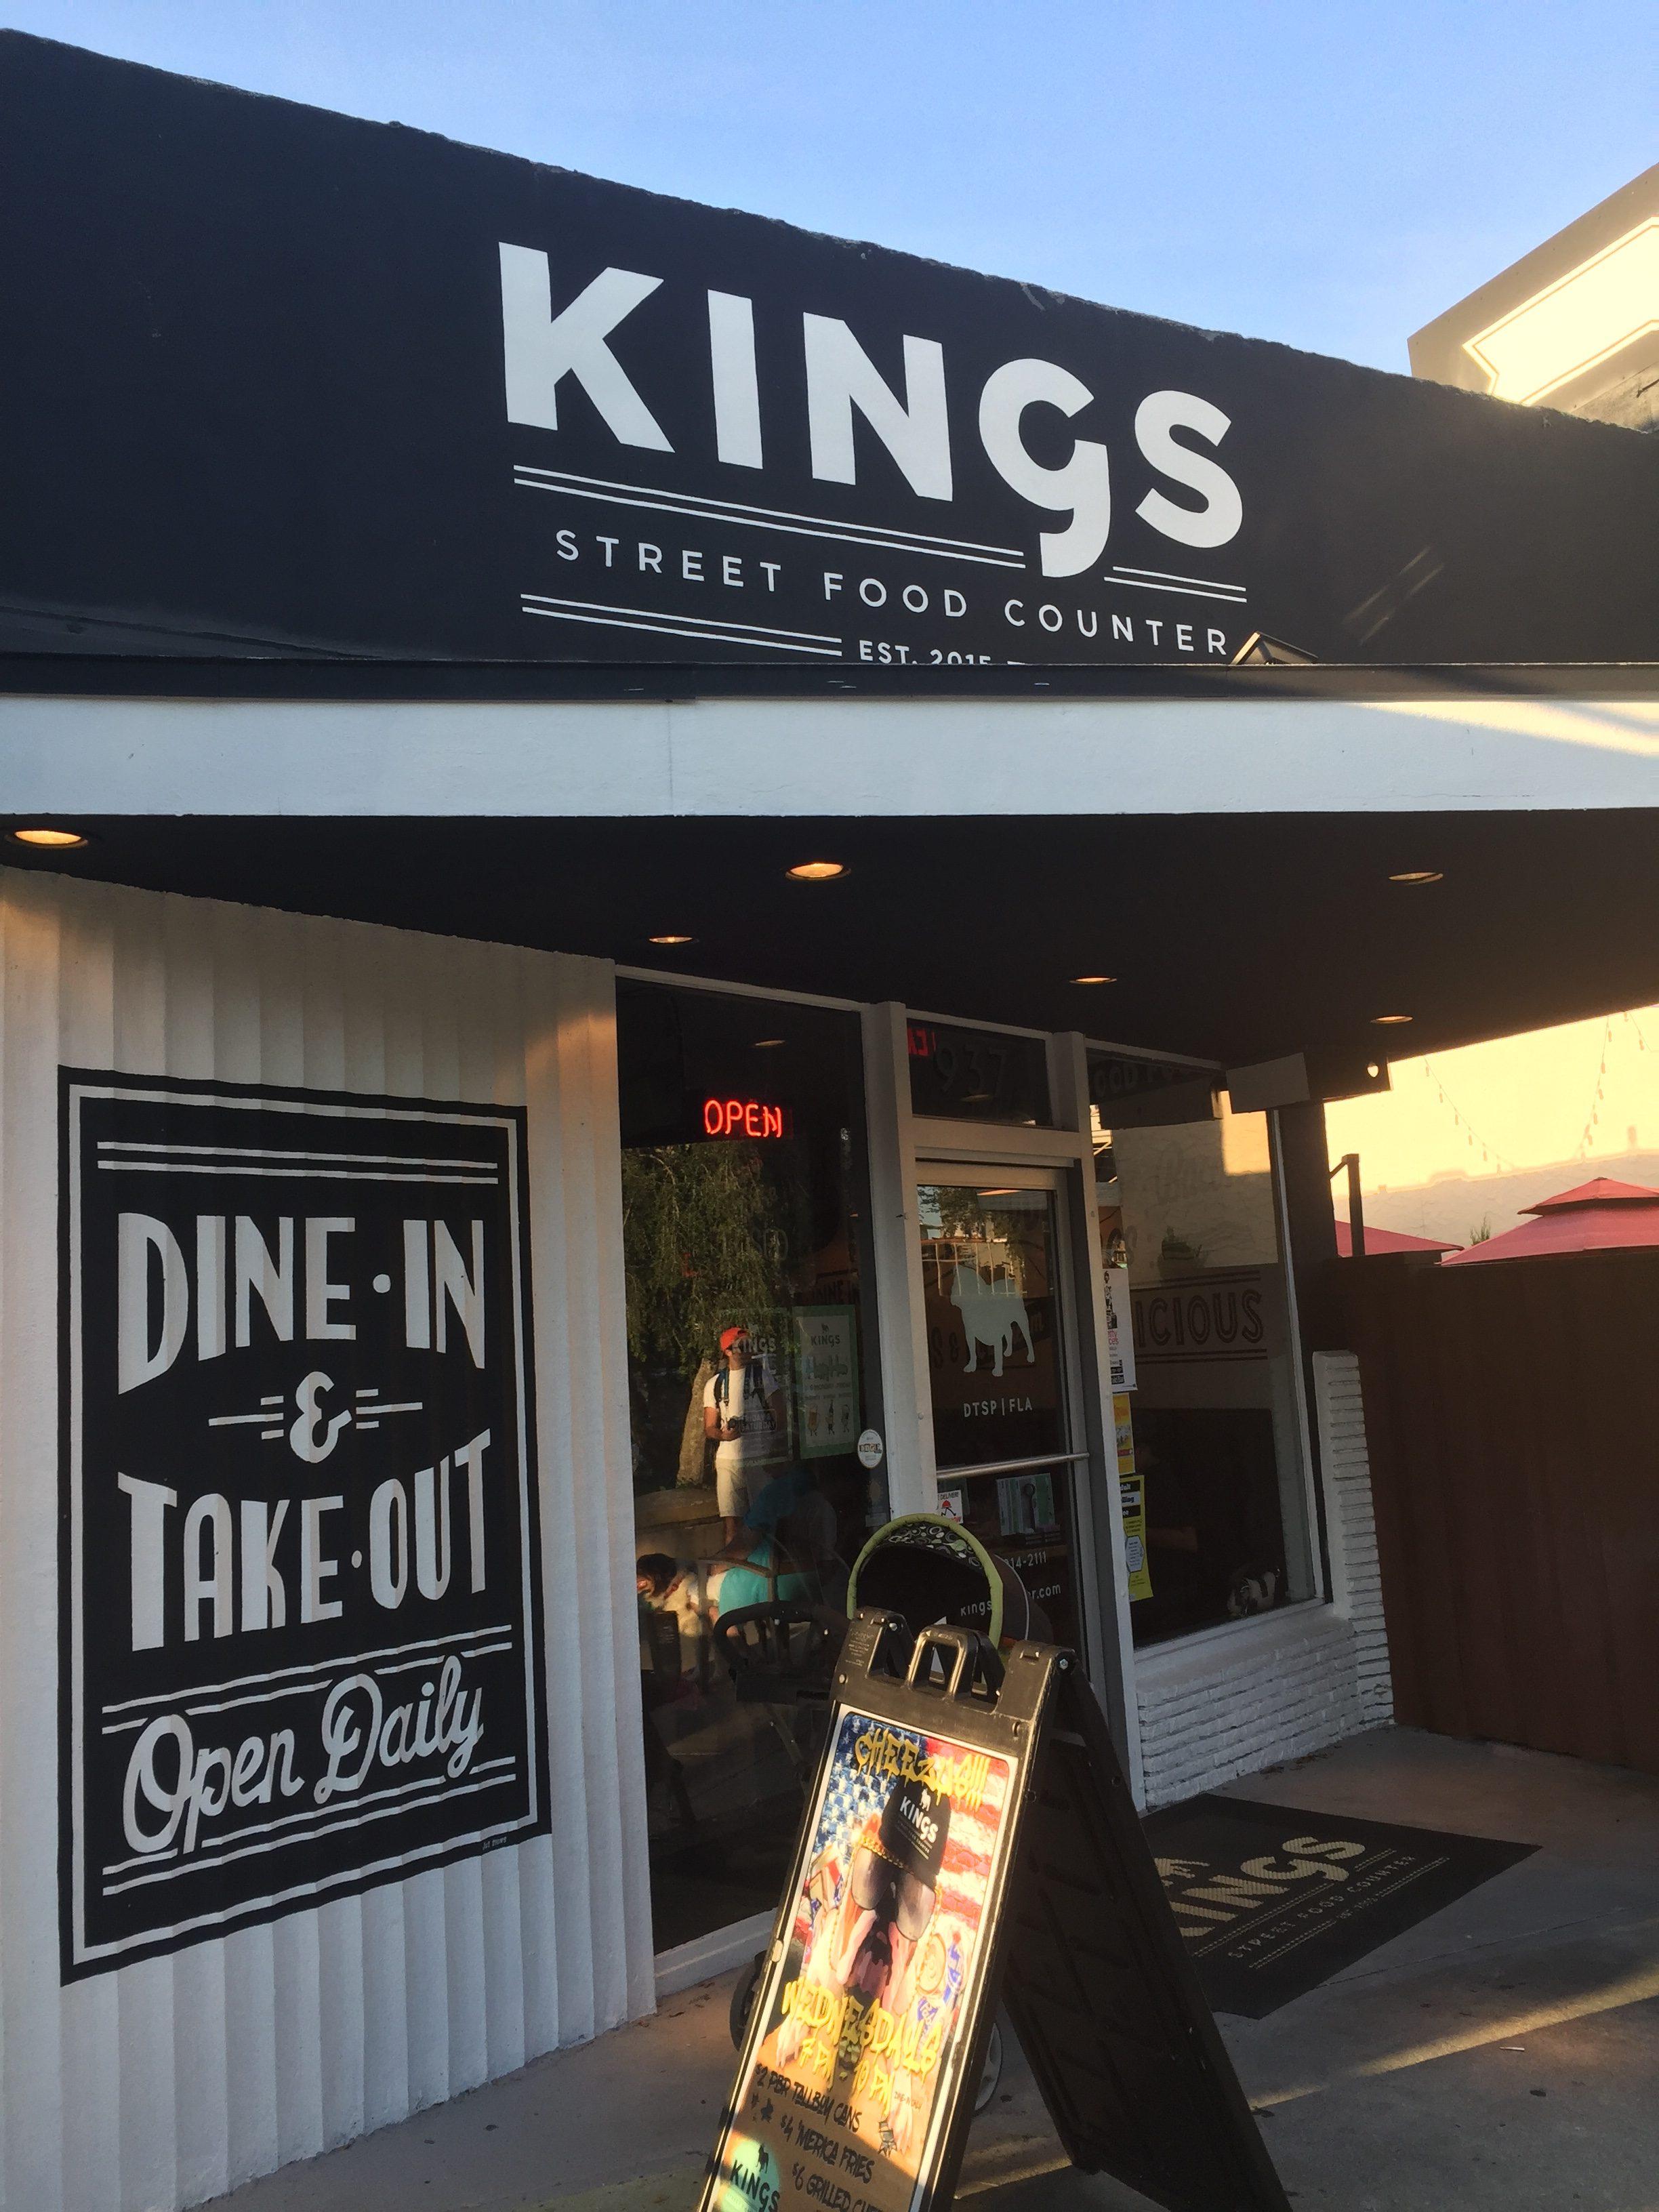 Kings Street Food Counter